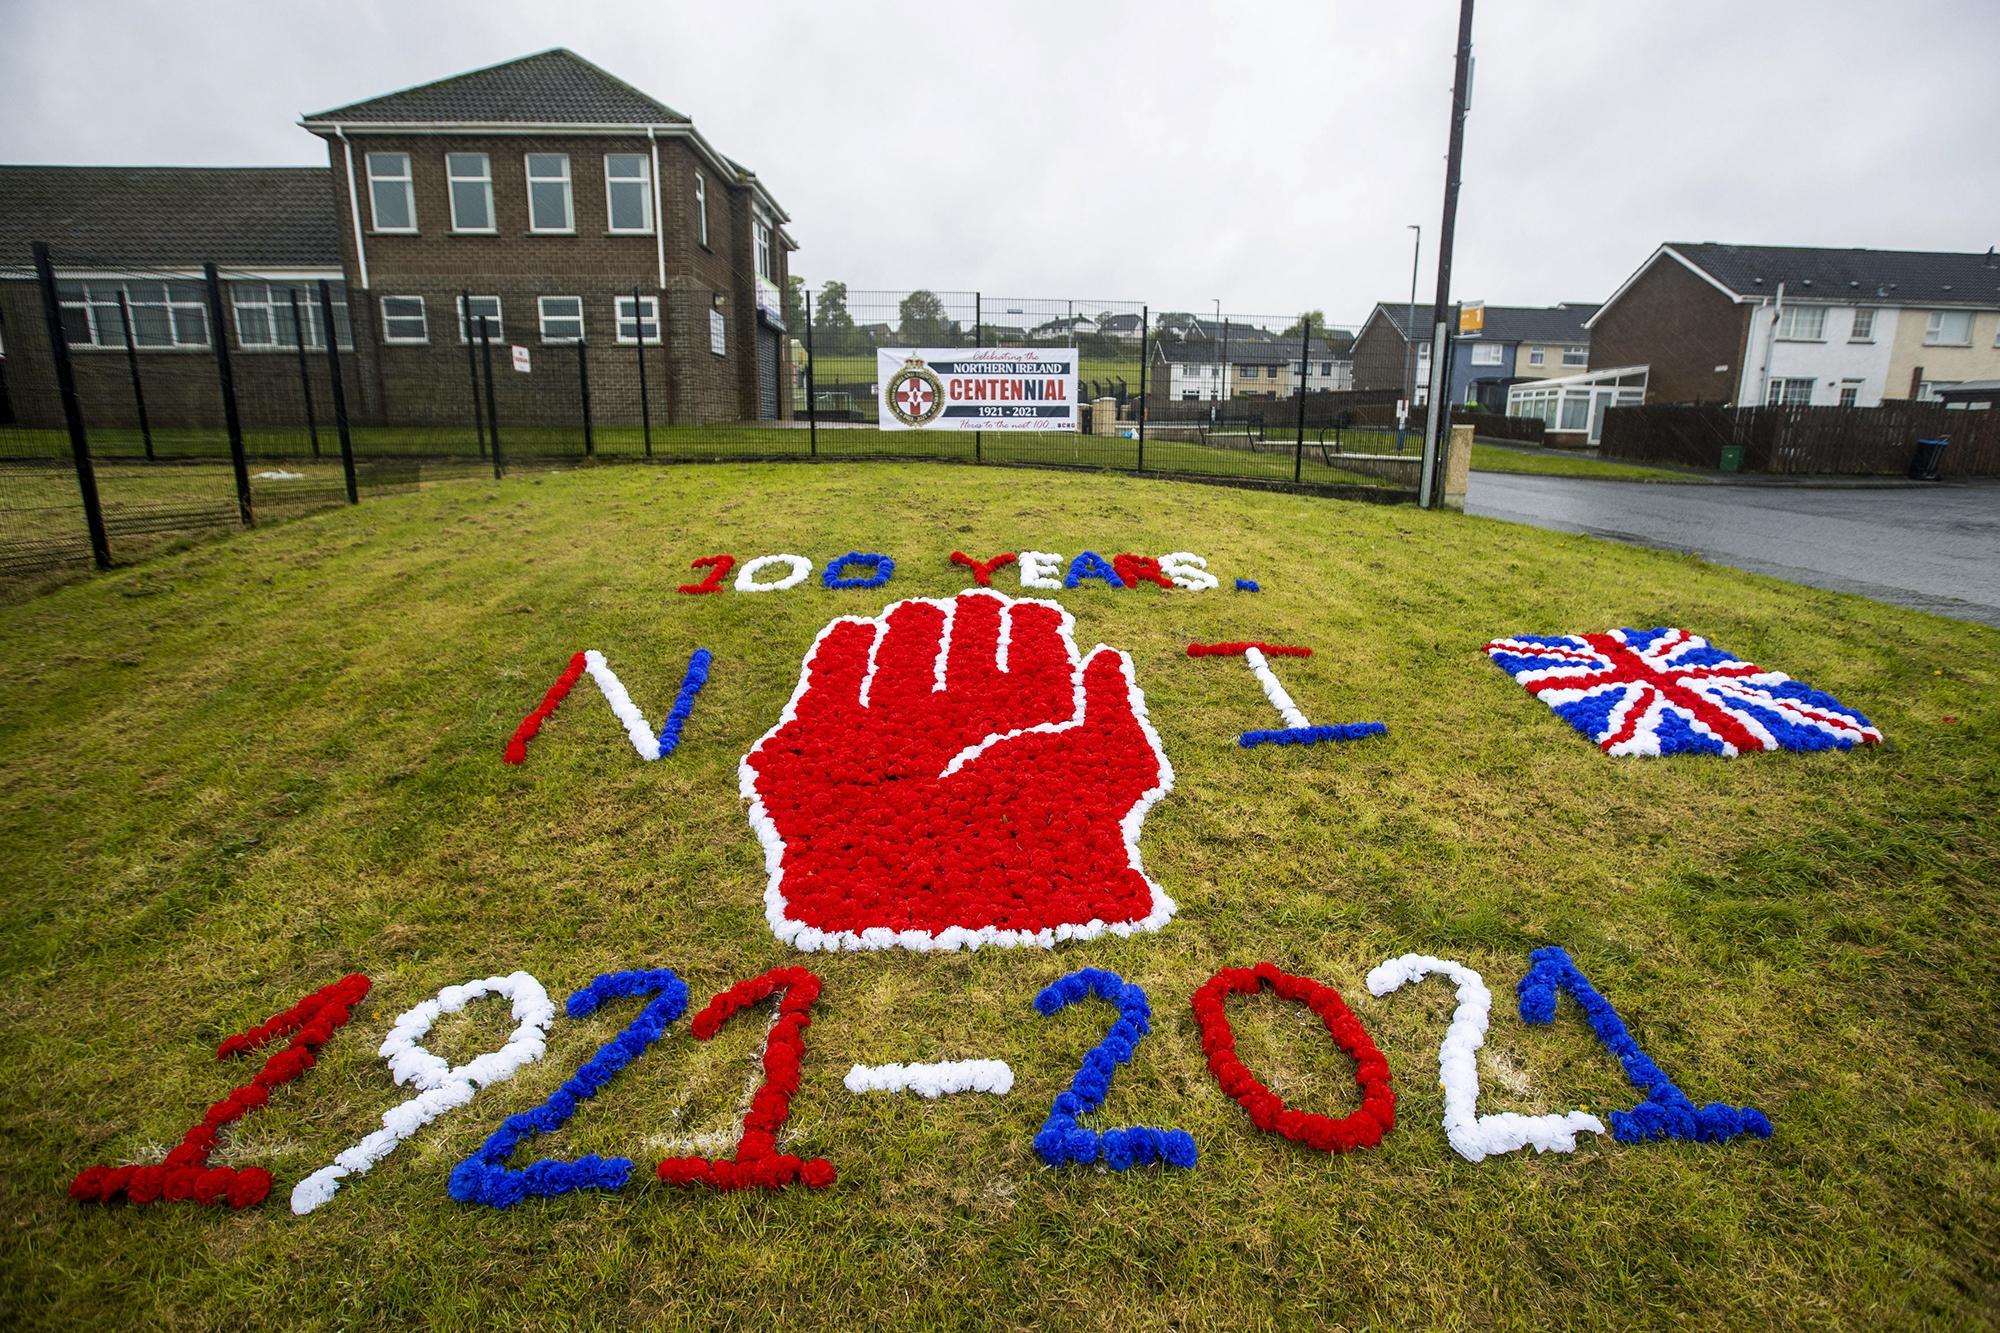 An anniversary display in Newtownabbey, Northern Ireland